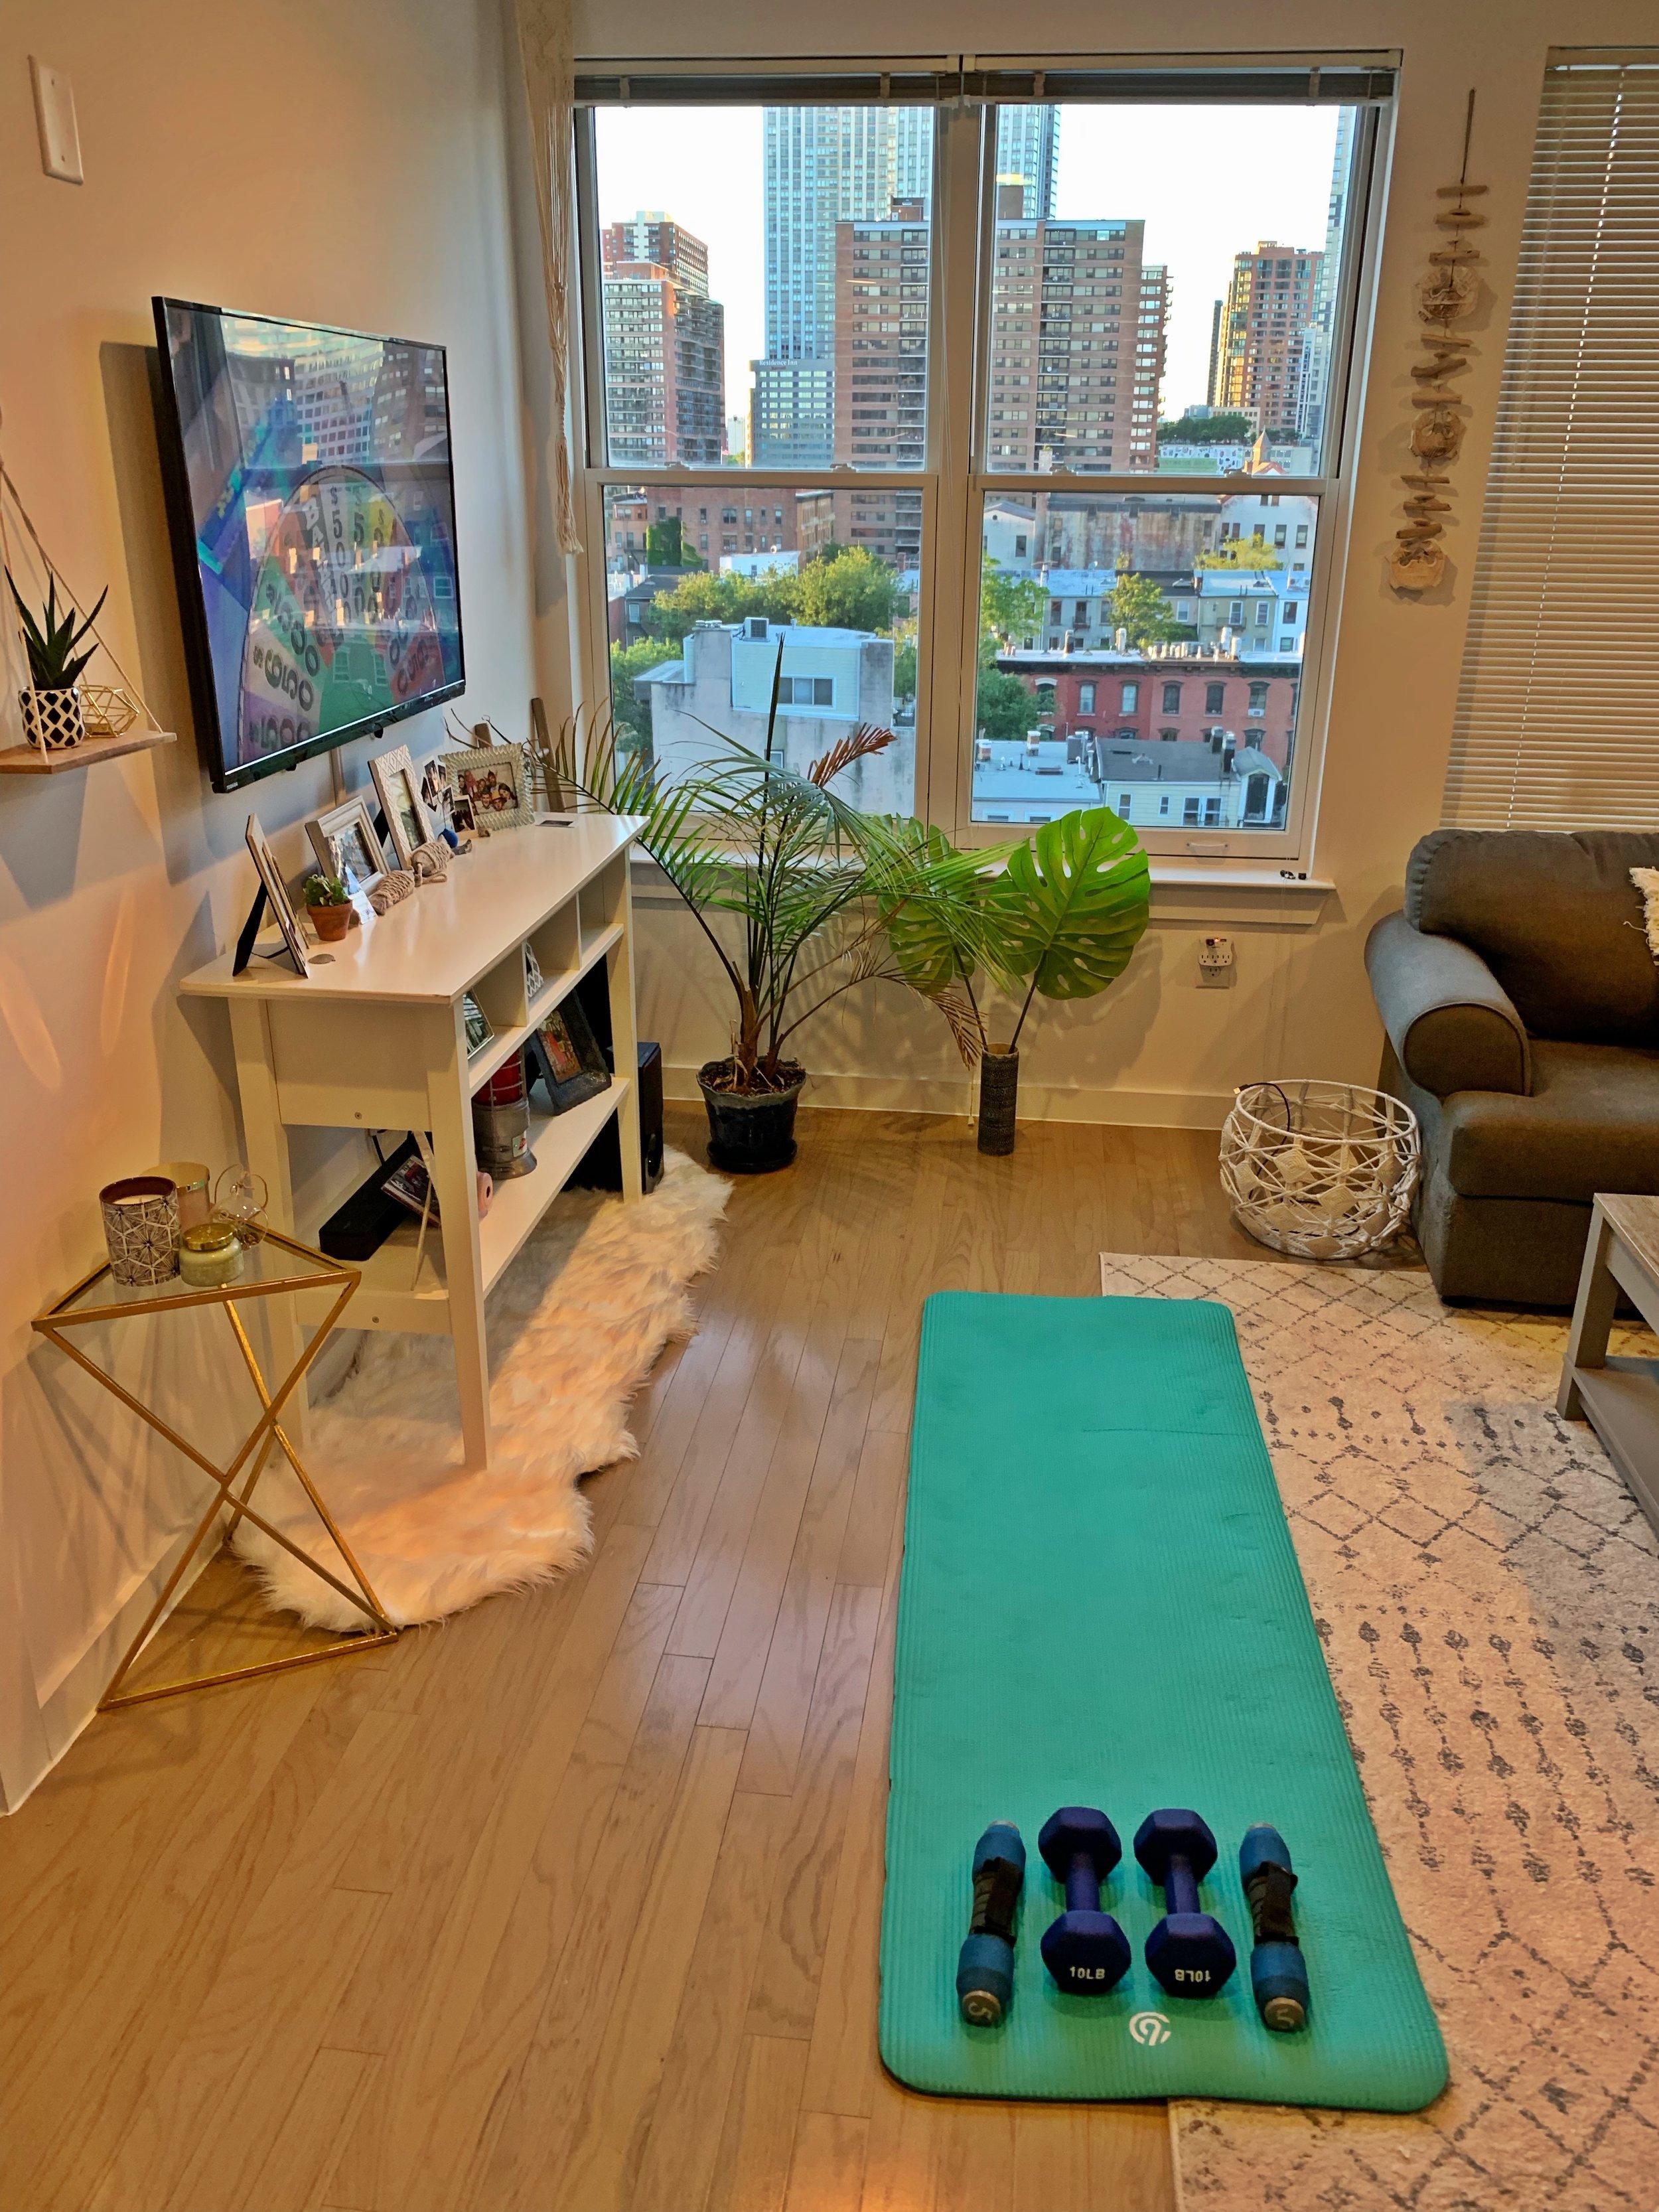 Lauren's home gym setup.